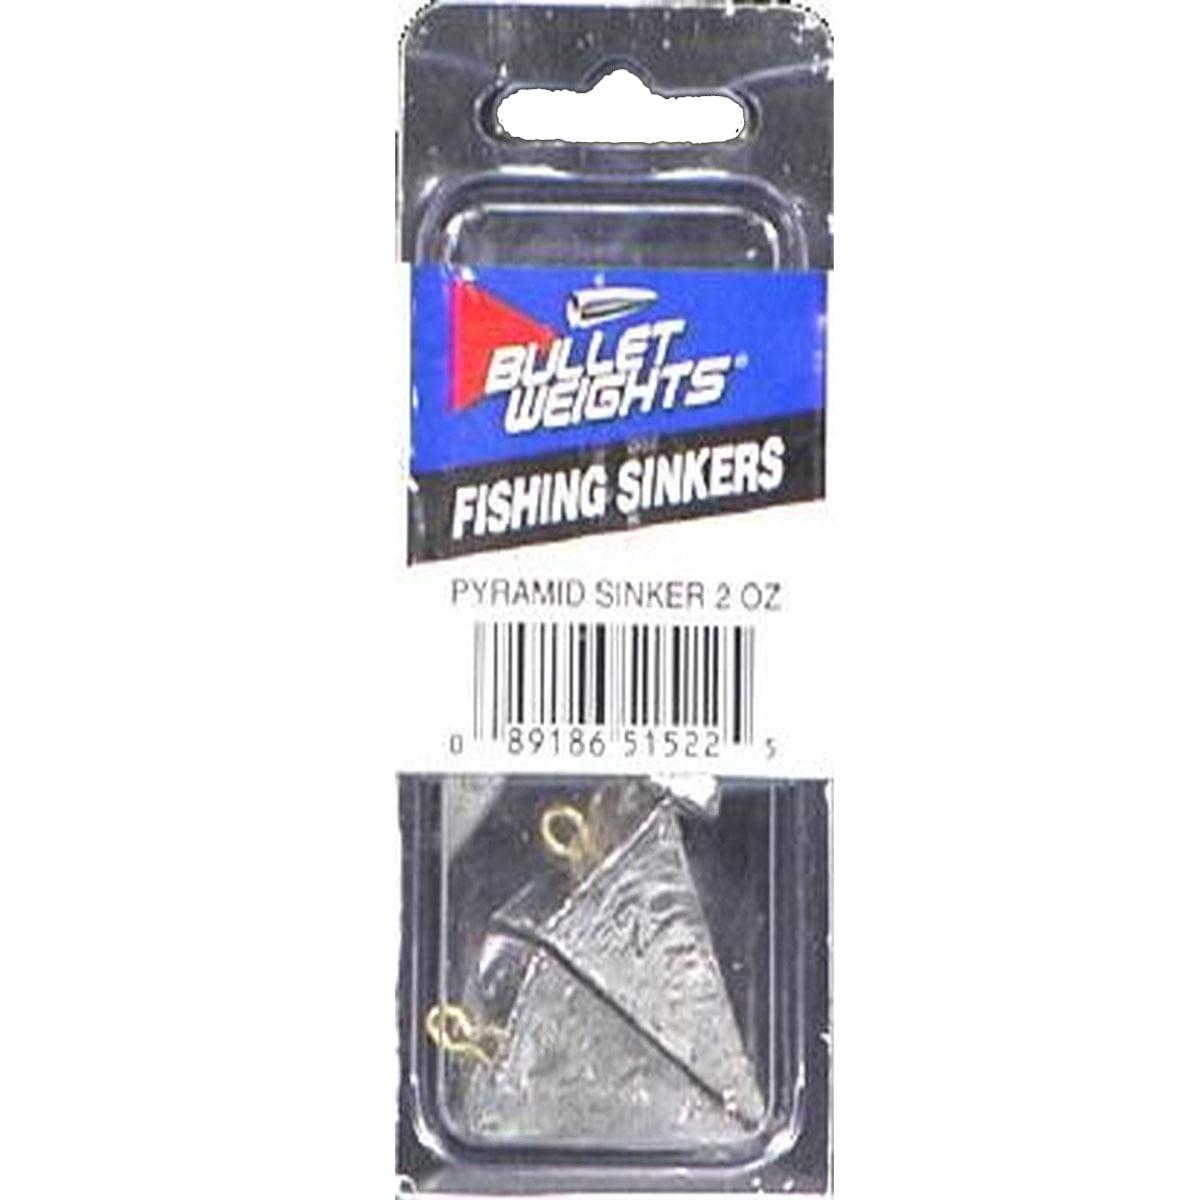 4 oz pyramid fishing sinkers 20 pack